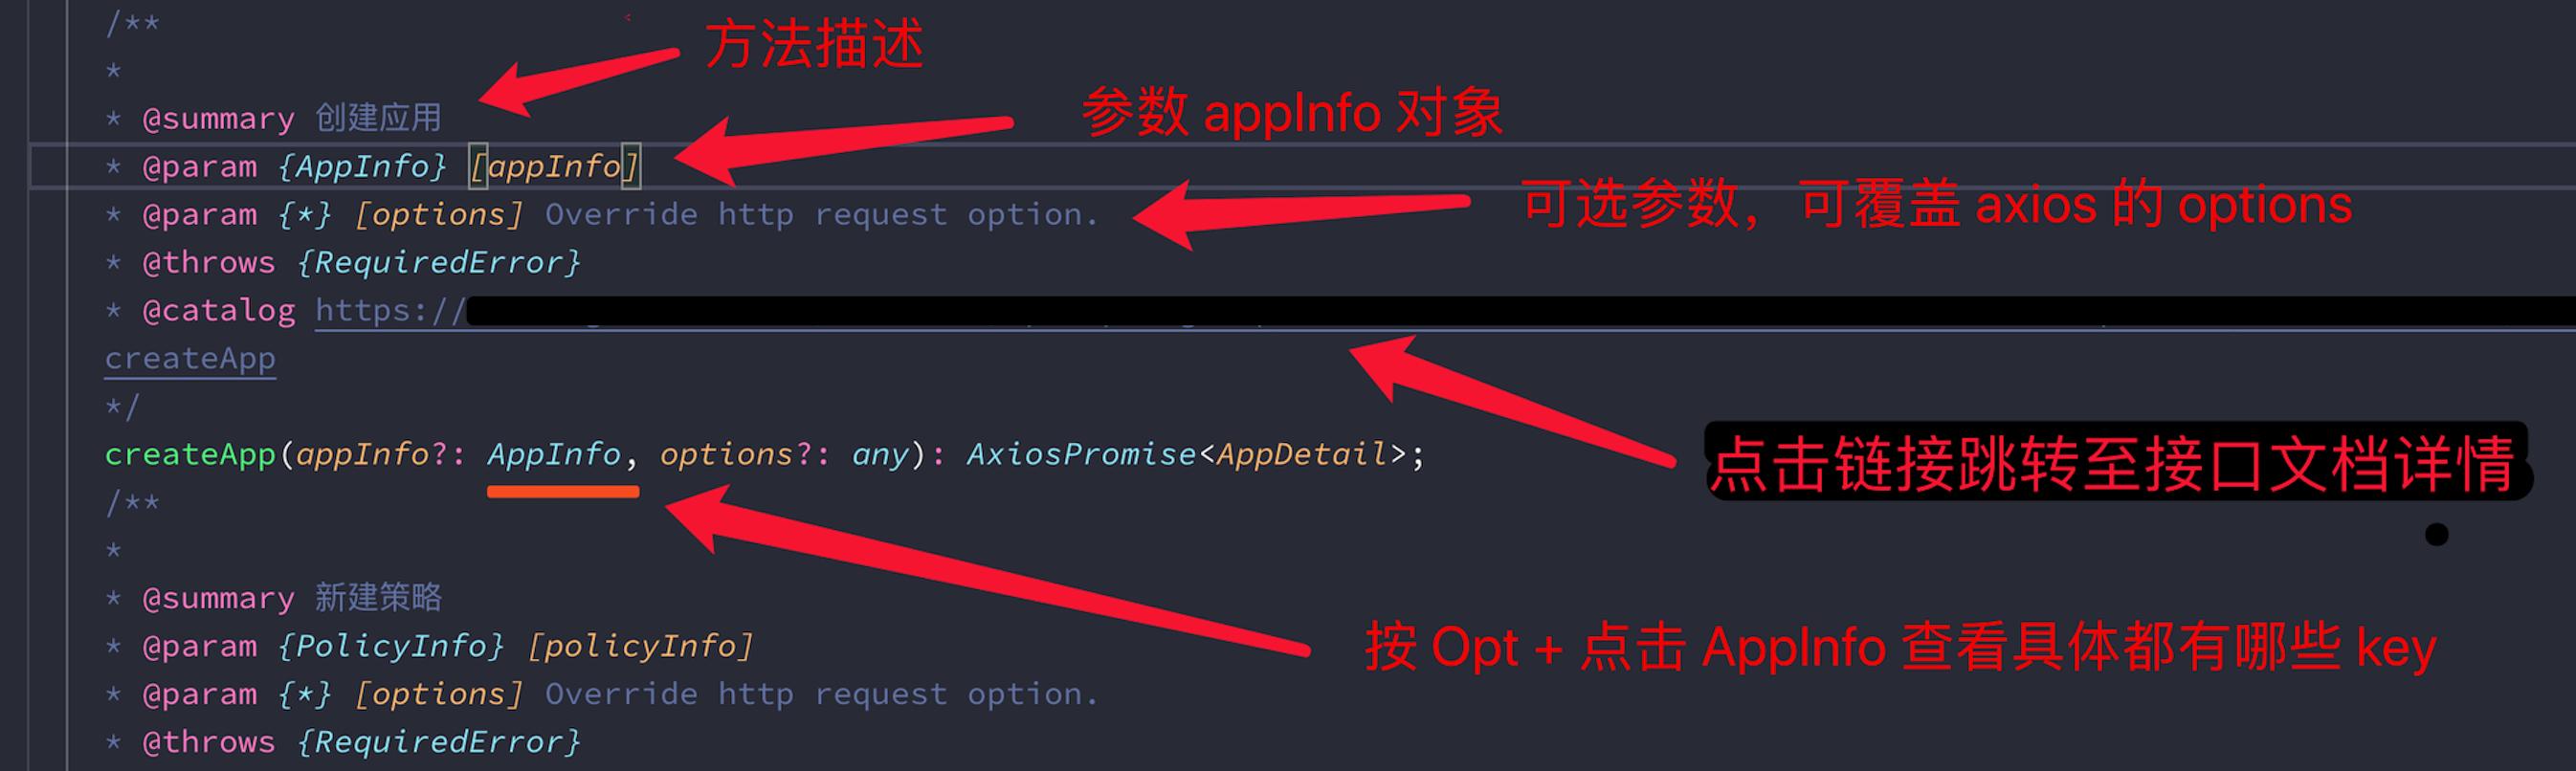 OpenAPI-Generator-Demo-Show3.png